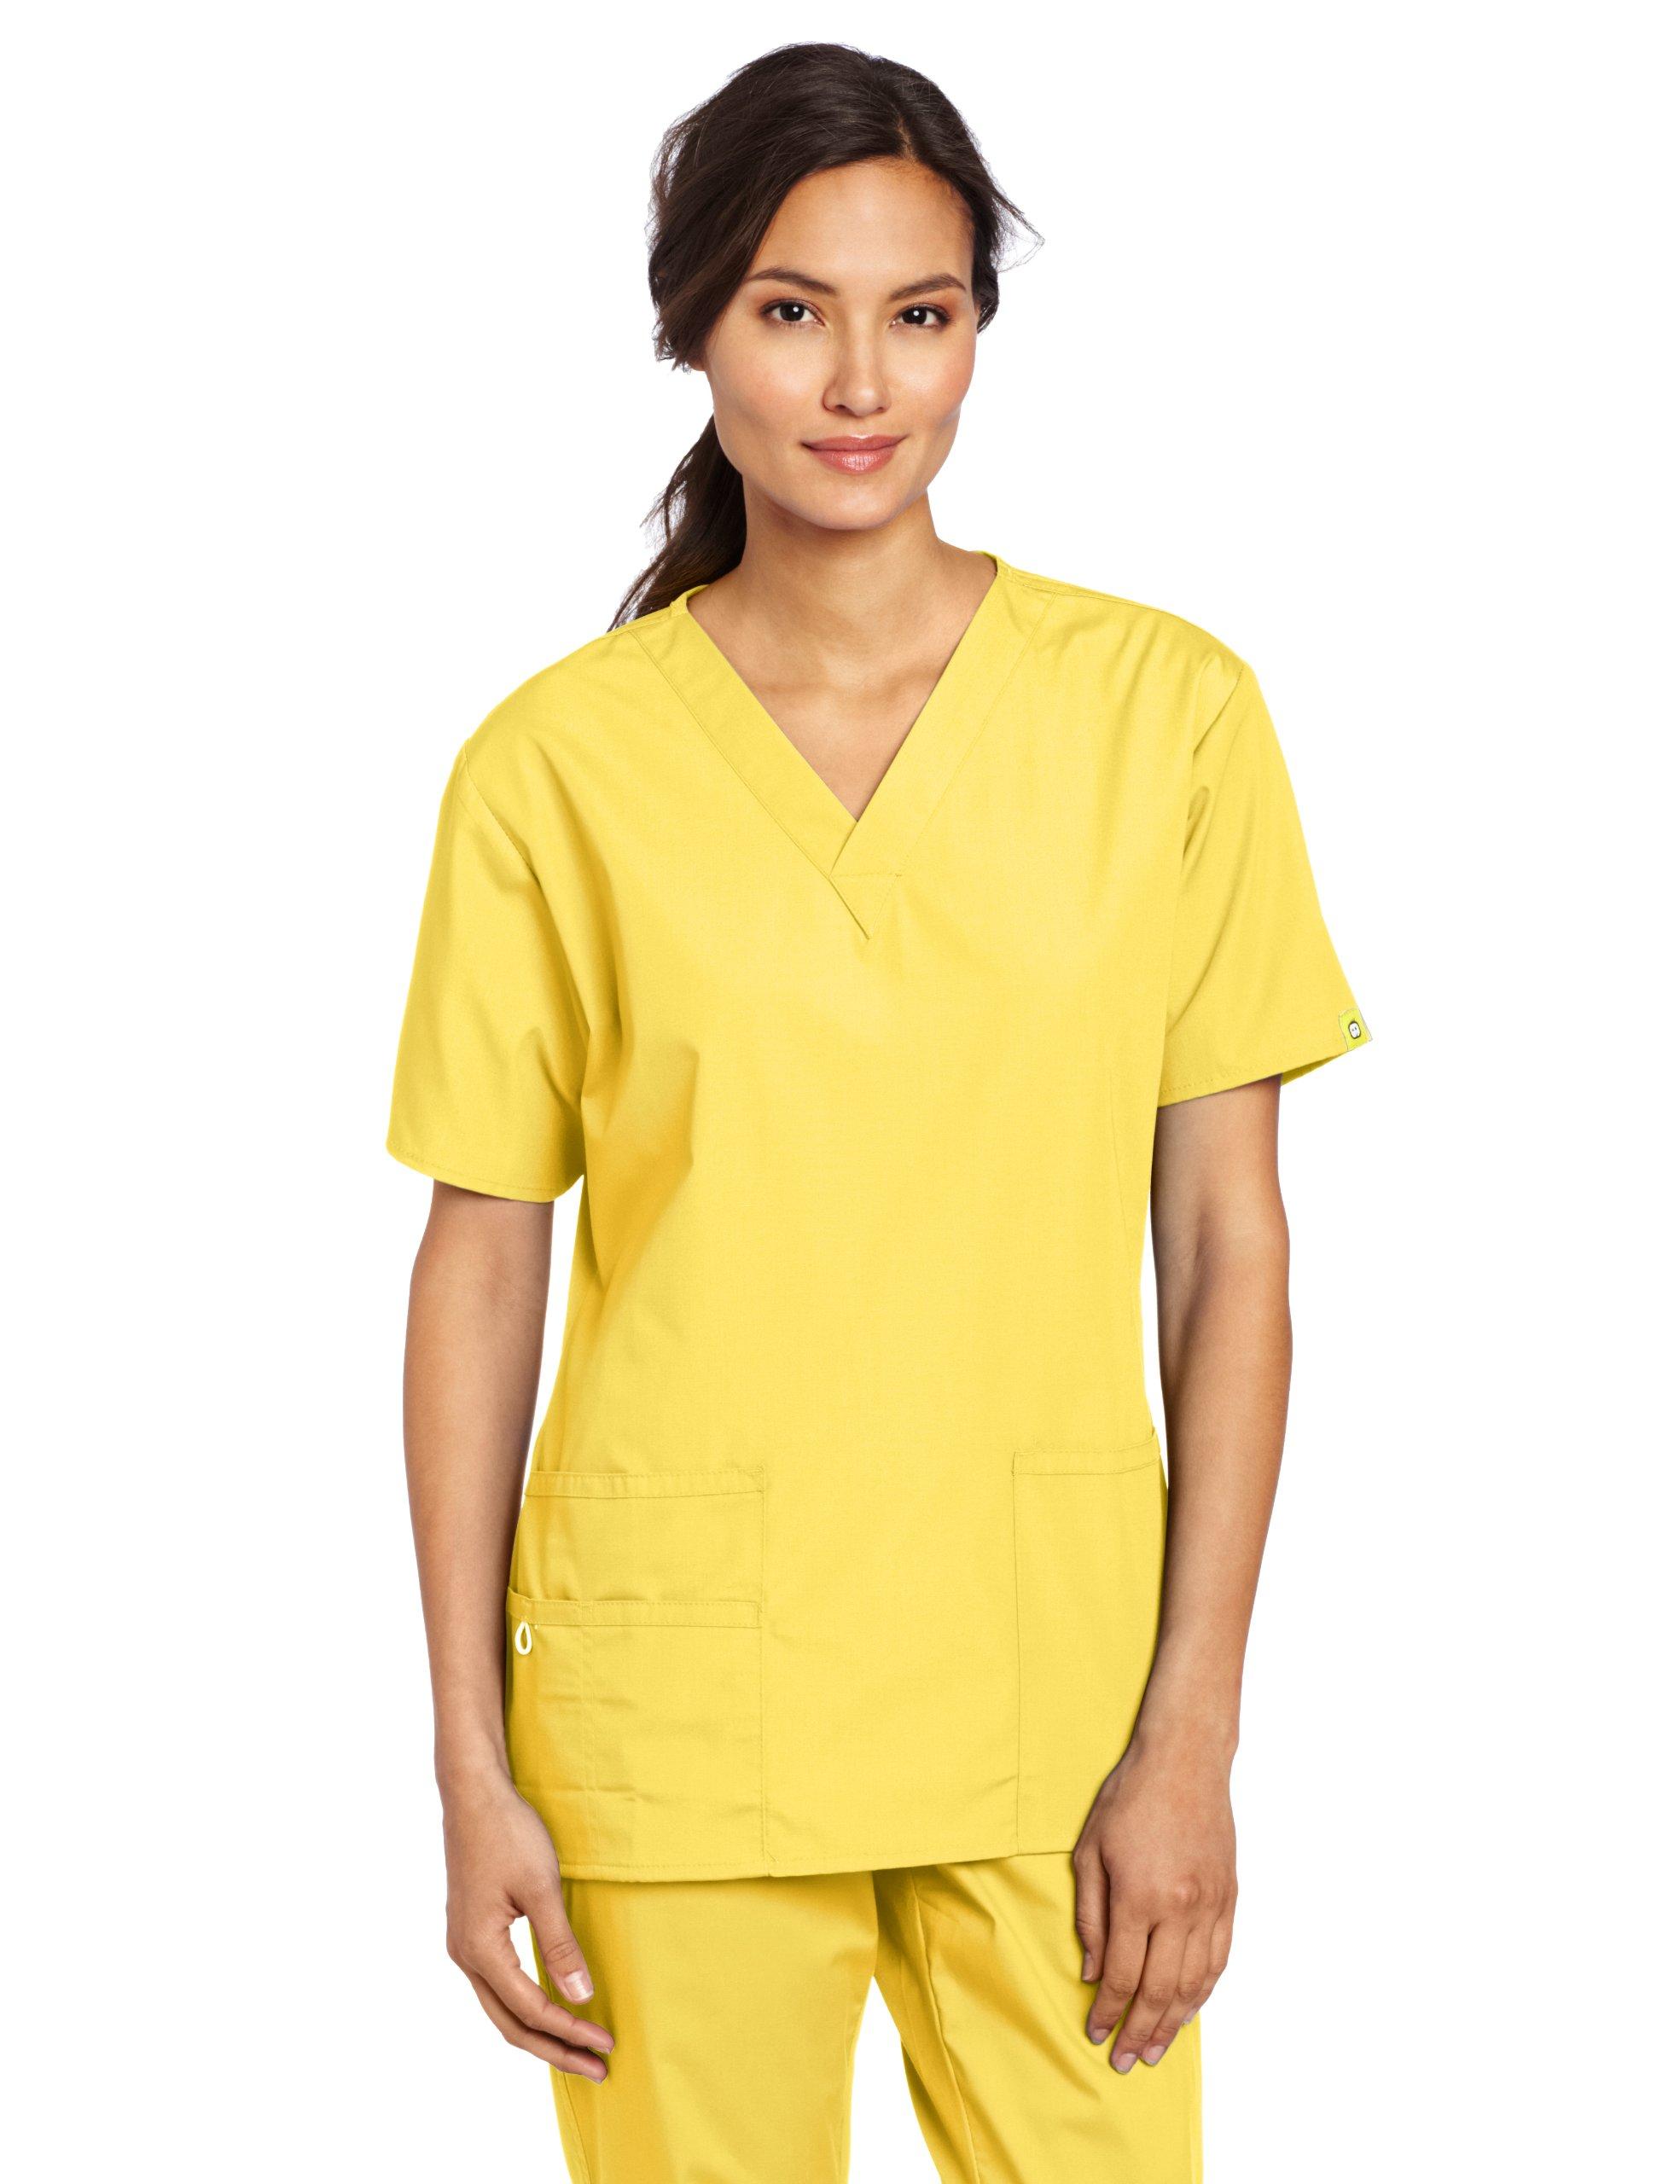 WonderWink Women's Scrubs Bravo 5 Pocket V-Neck Top, Yellow, 2X-Large